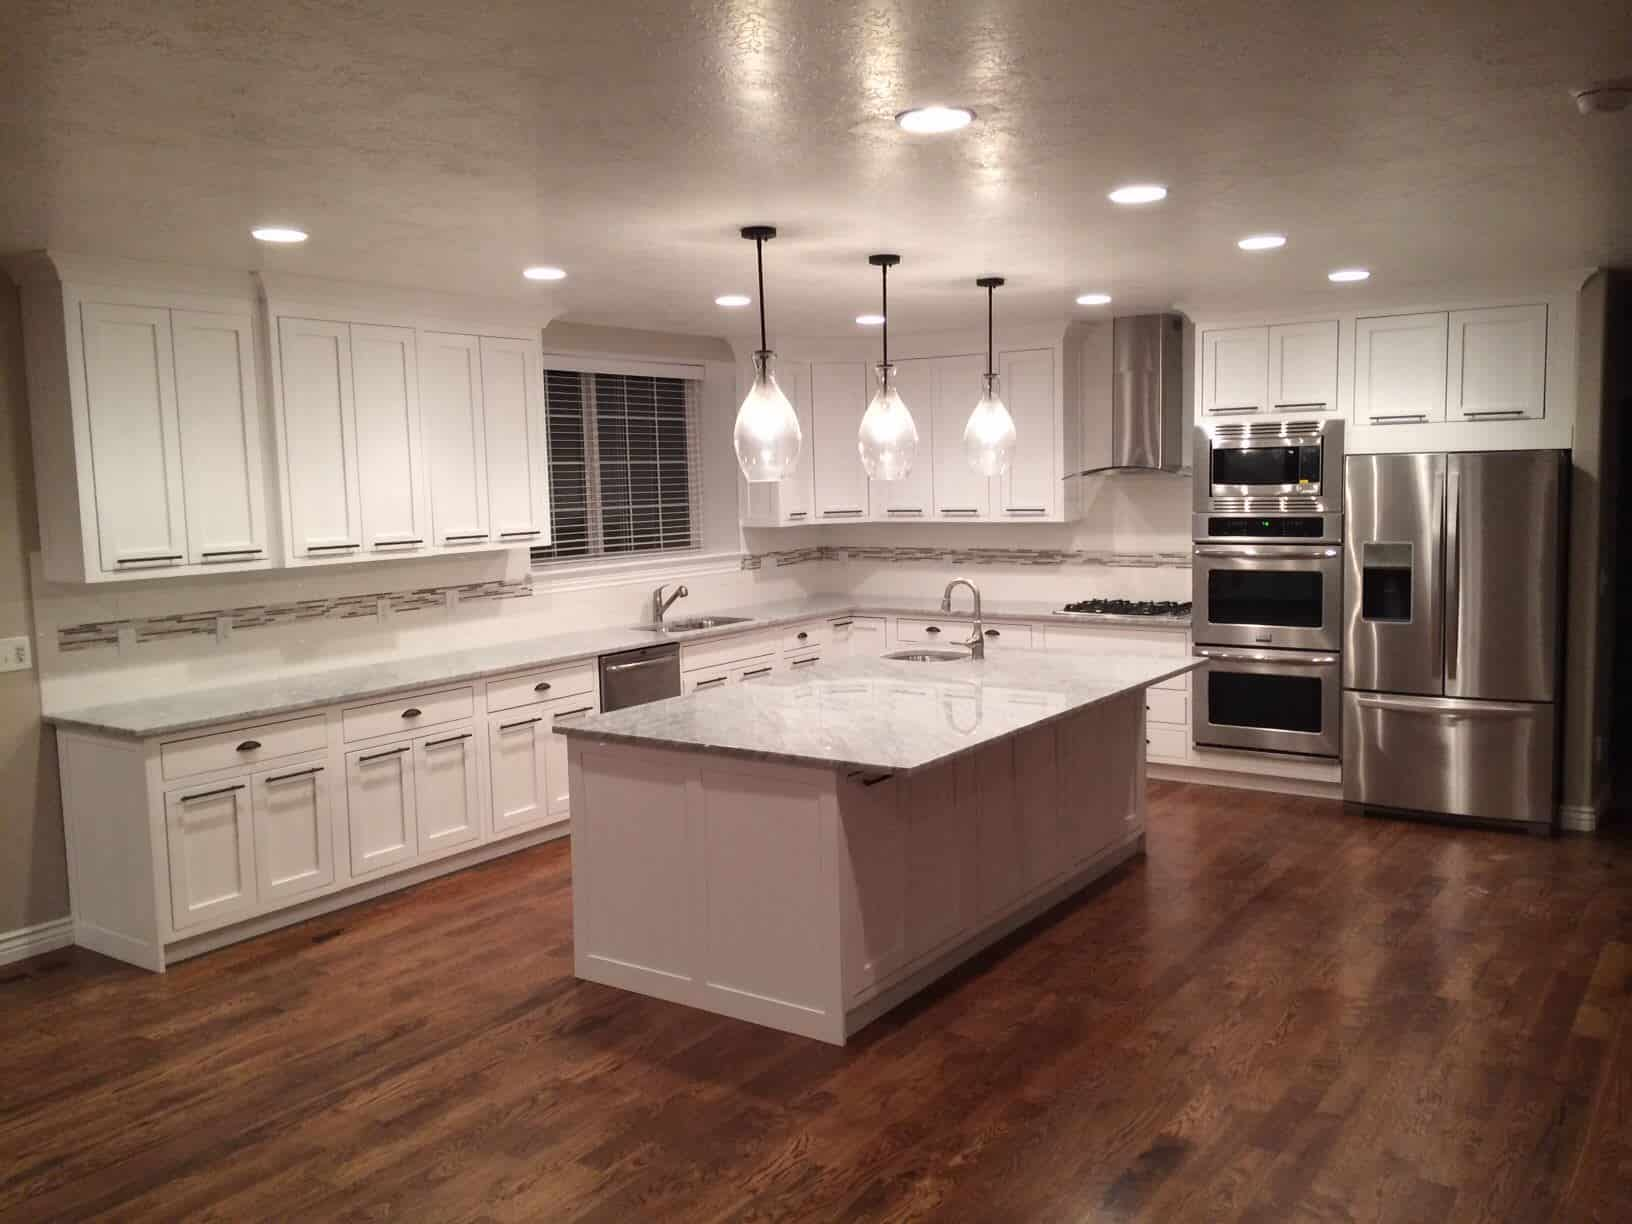 Medium tone hardwood floor in kitchen